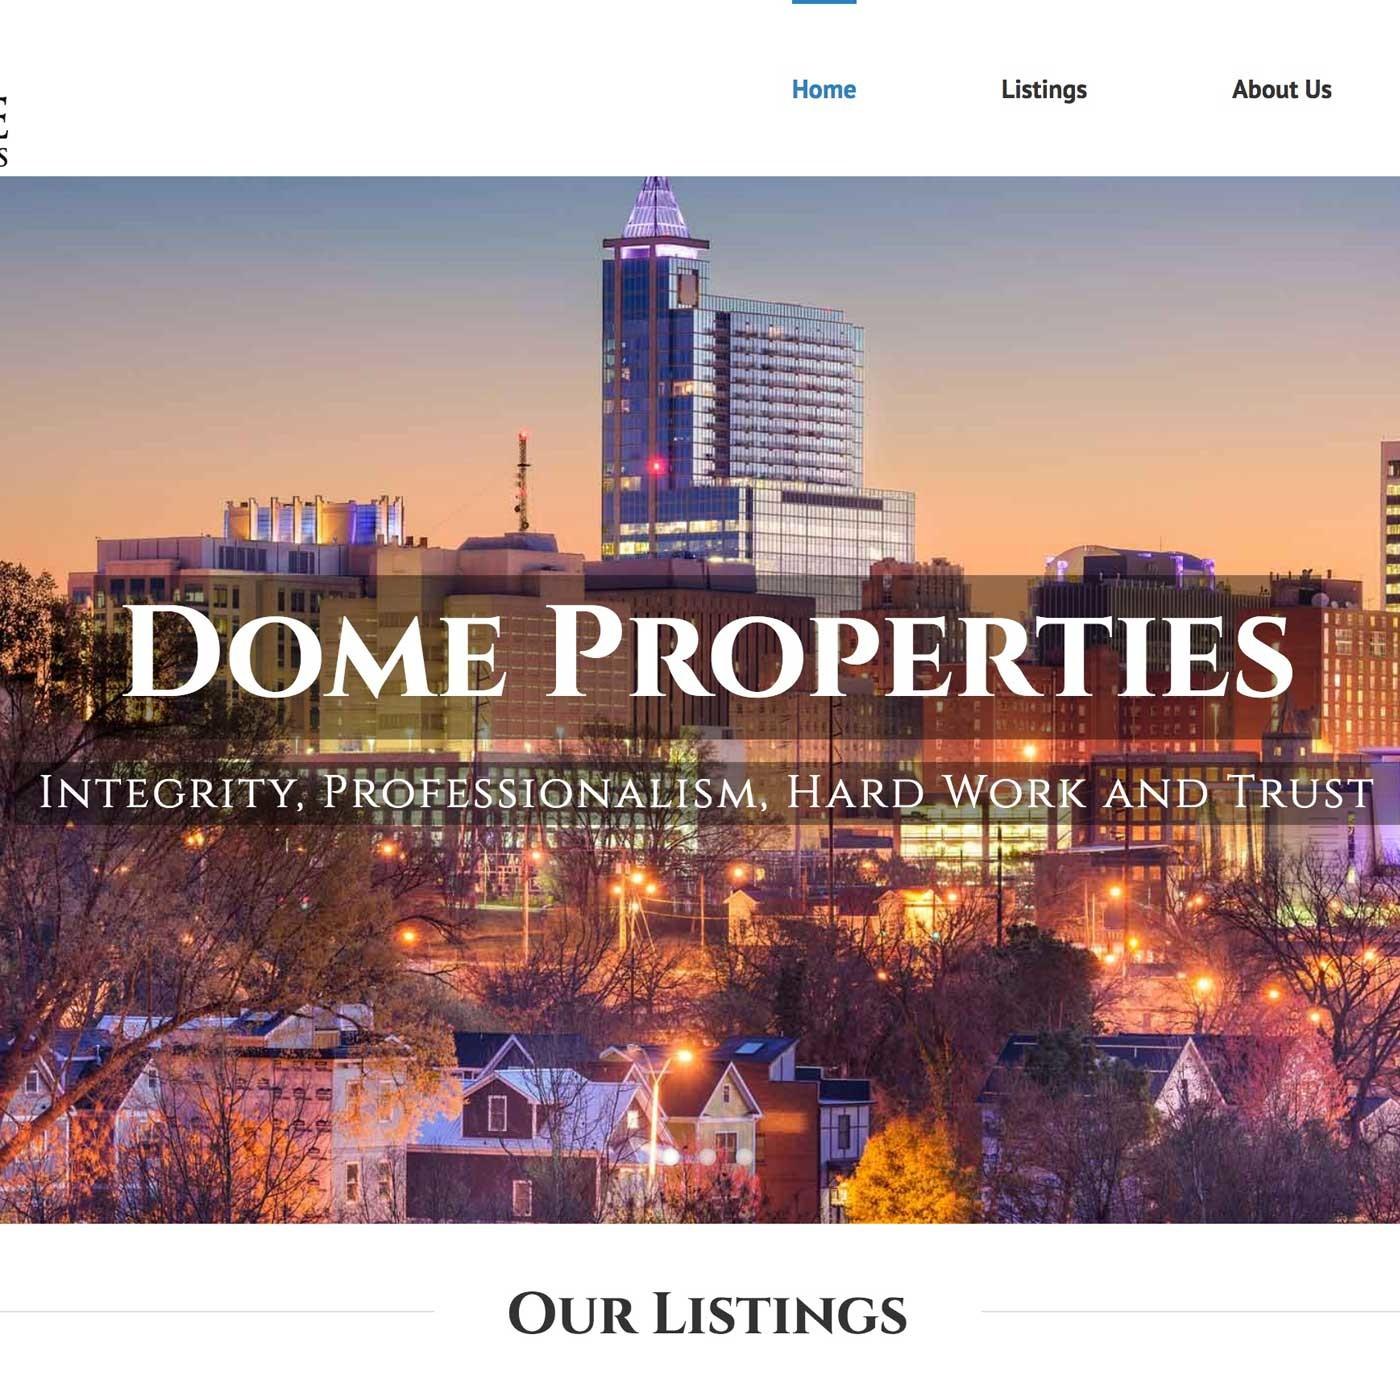 Dome Properties